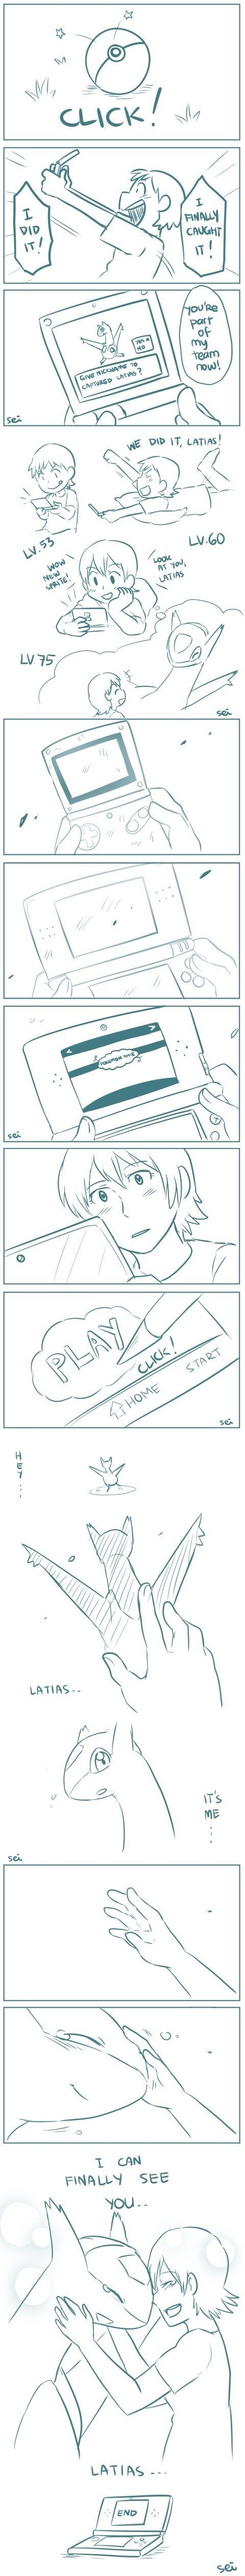 Latias is my favourite pokemon too :)